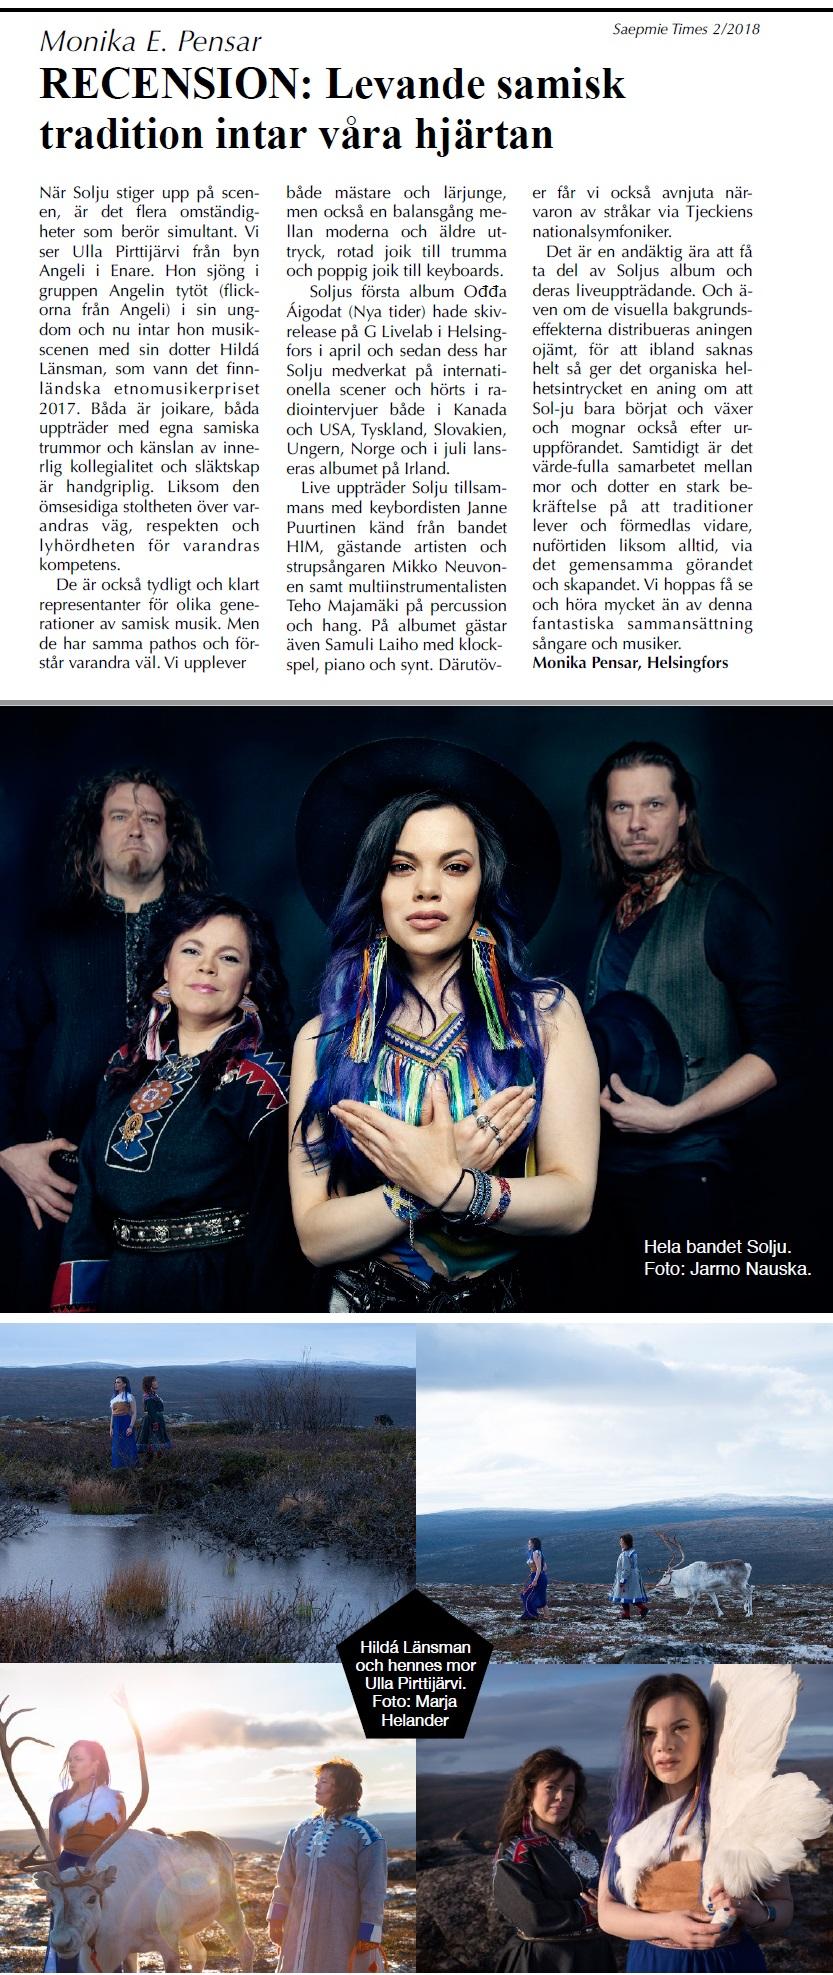 Saepmie Times (Sweden), Nummer 2, Juli 2018